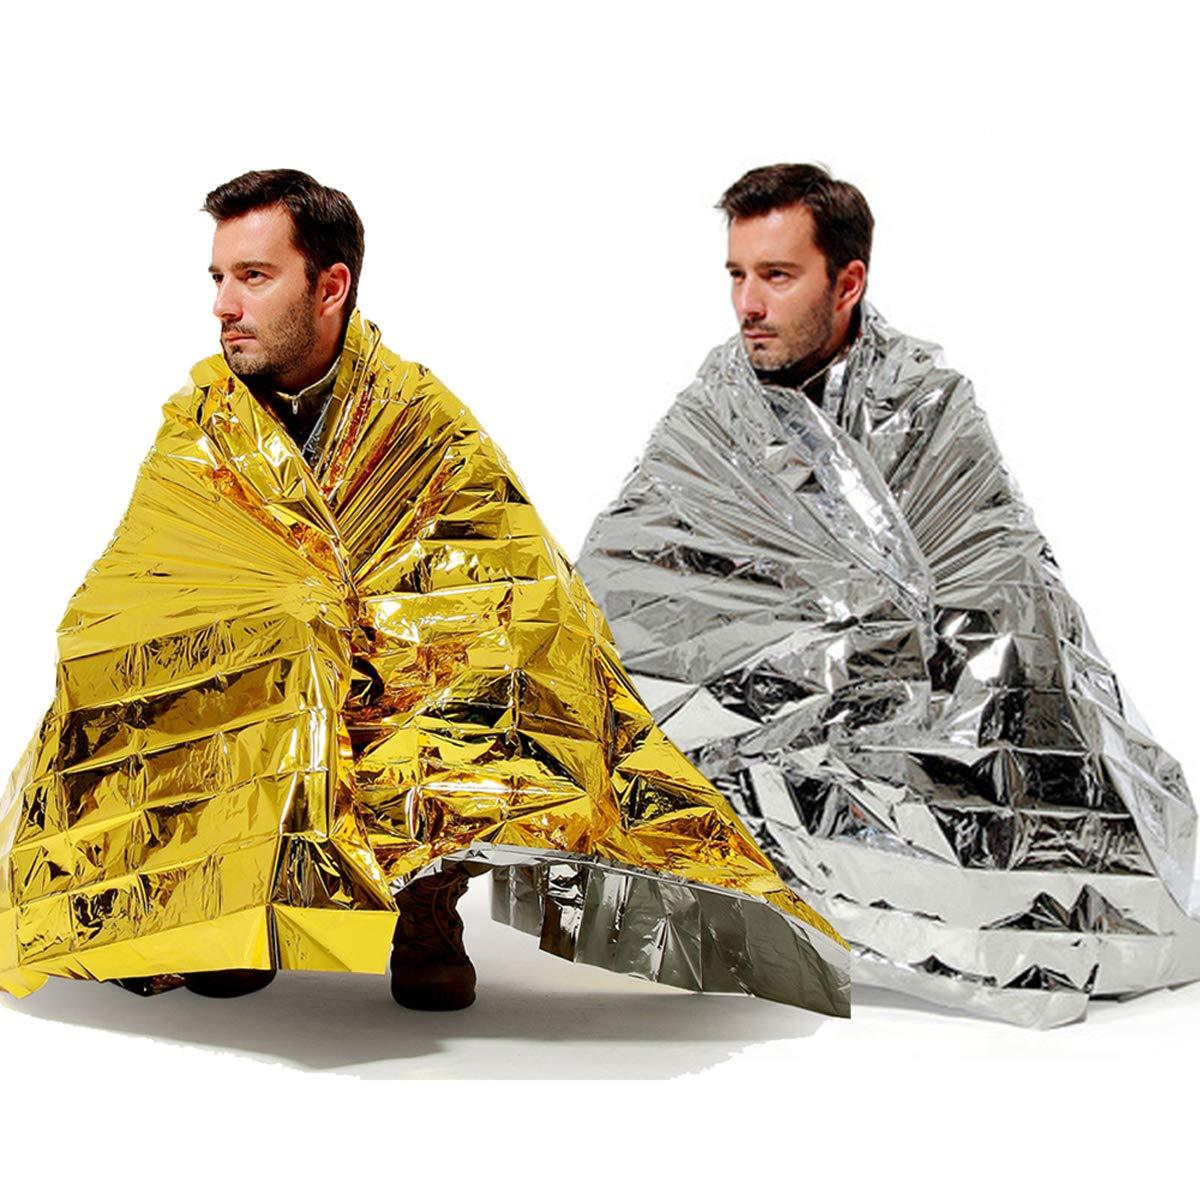 BINHAI Manta térmica de Emergencia para Supervivencia, Reflectante, Dos Tonos, 52 Pulgadas x 83 Pulgadas (2 Unidades)